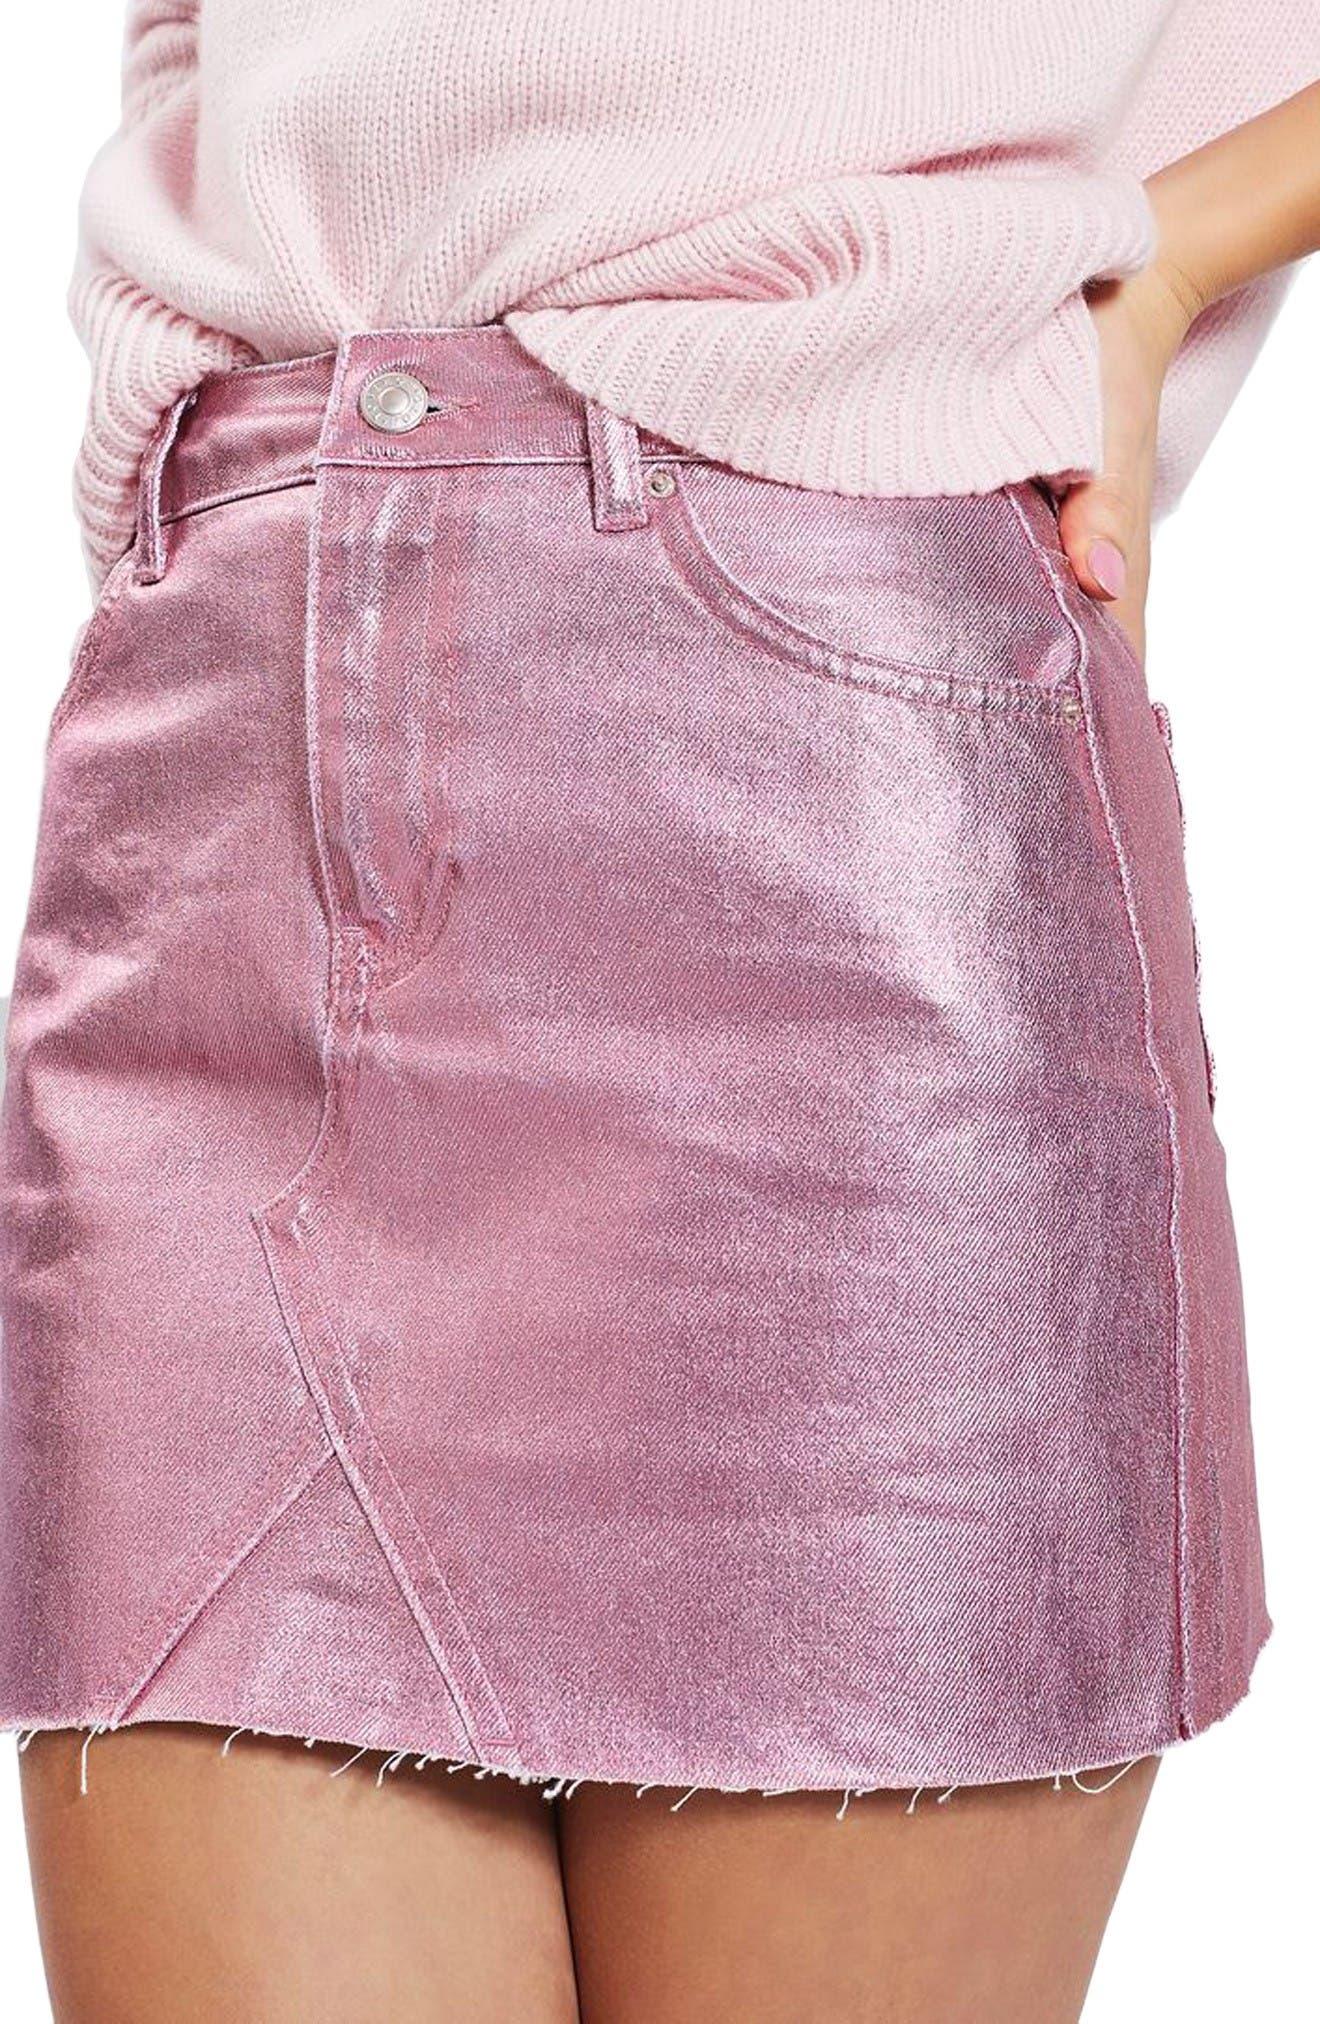 Main Image - Topshop Moto High Waist Metallic Denim Miniskirt (Regular & Petite)